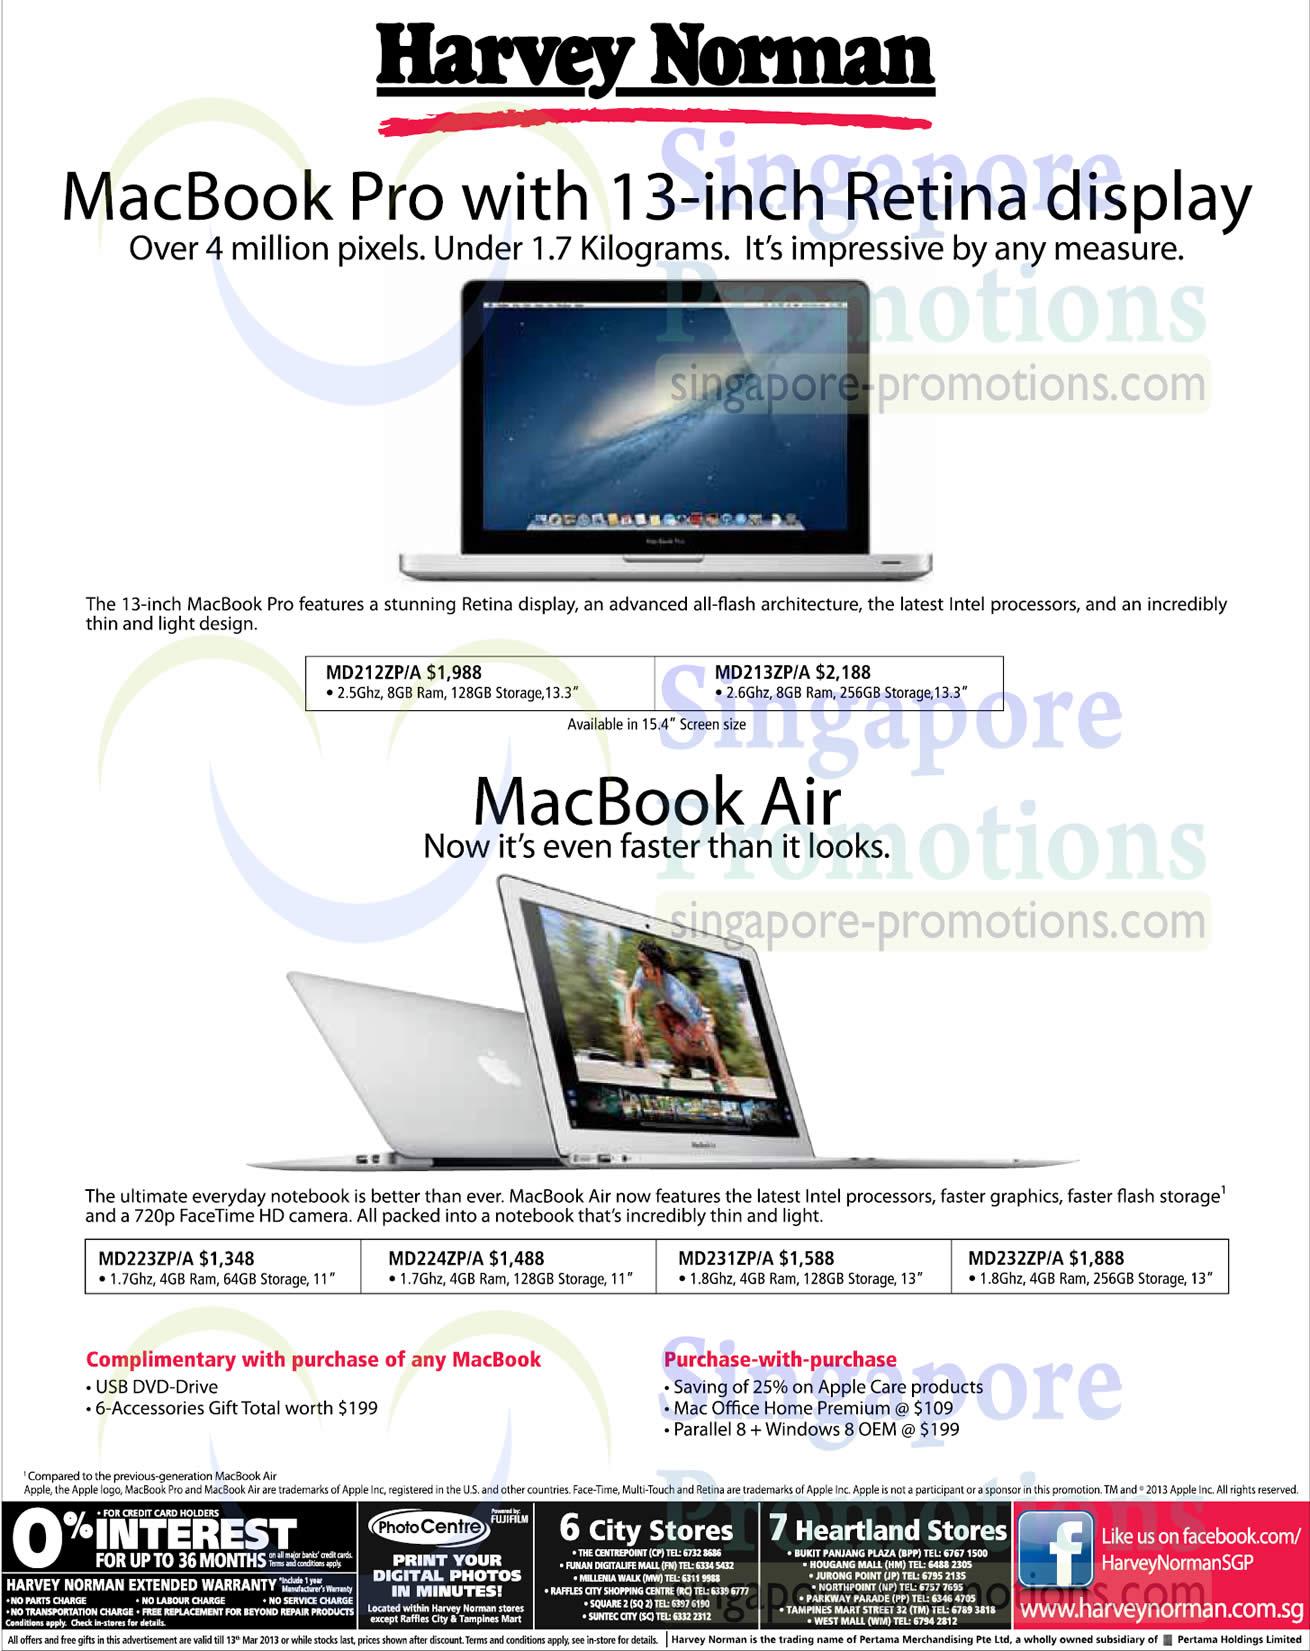 MacBook Pro with 13-inch Retina Diaplay, MacBook Air